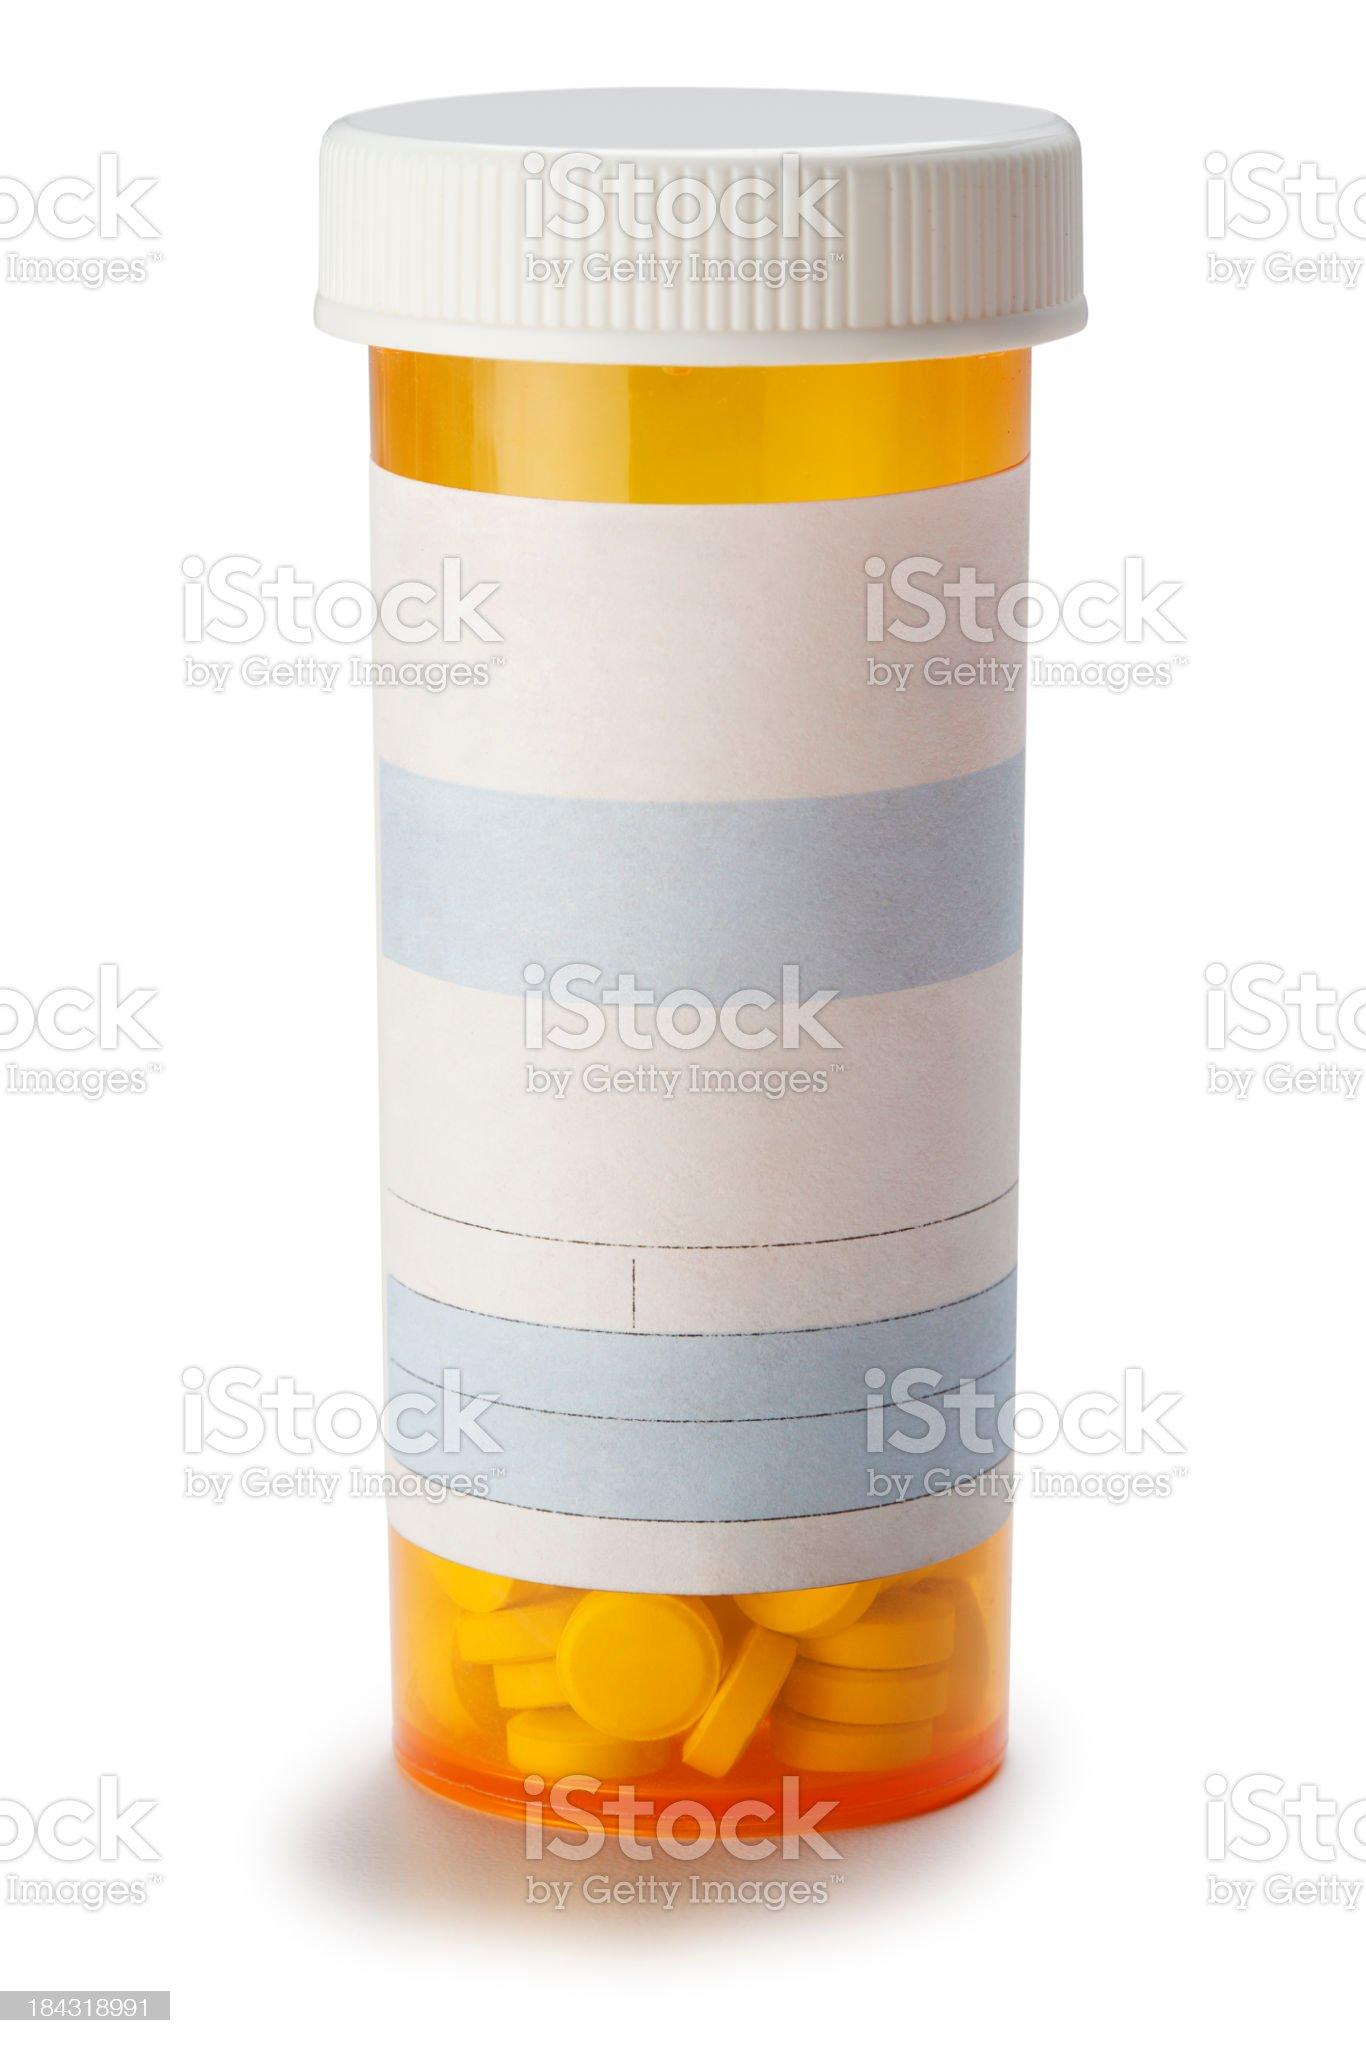 Blank prescription medication bottle on white background. royalty-free stock photo